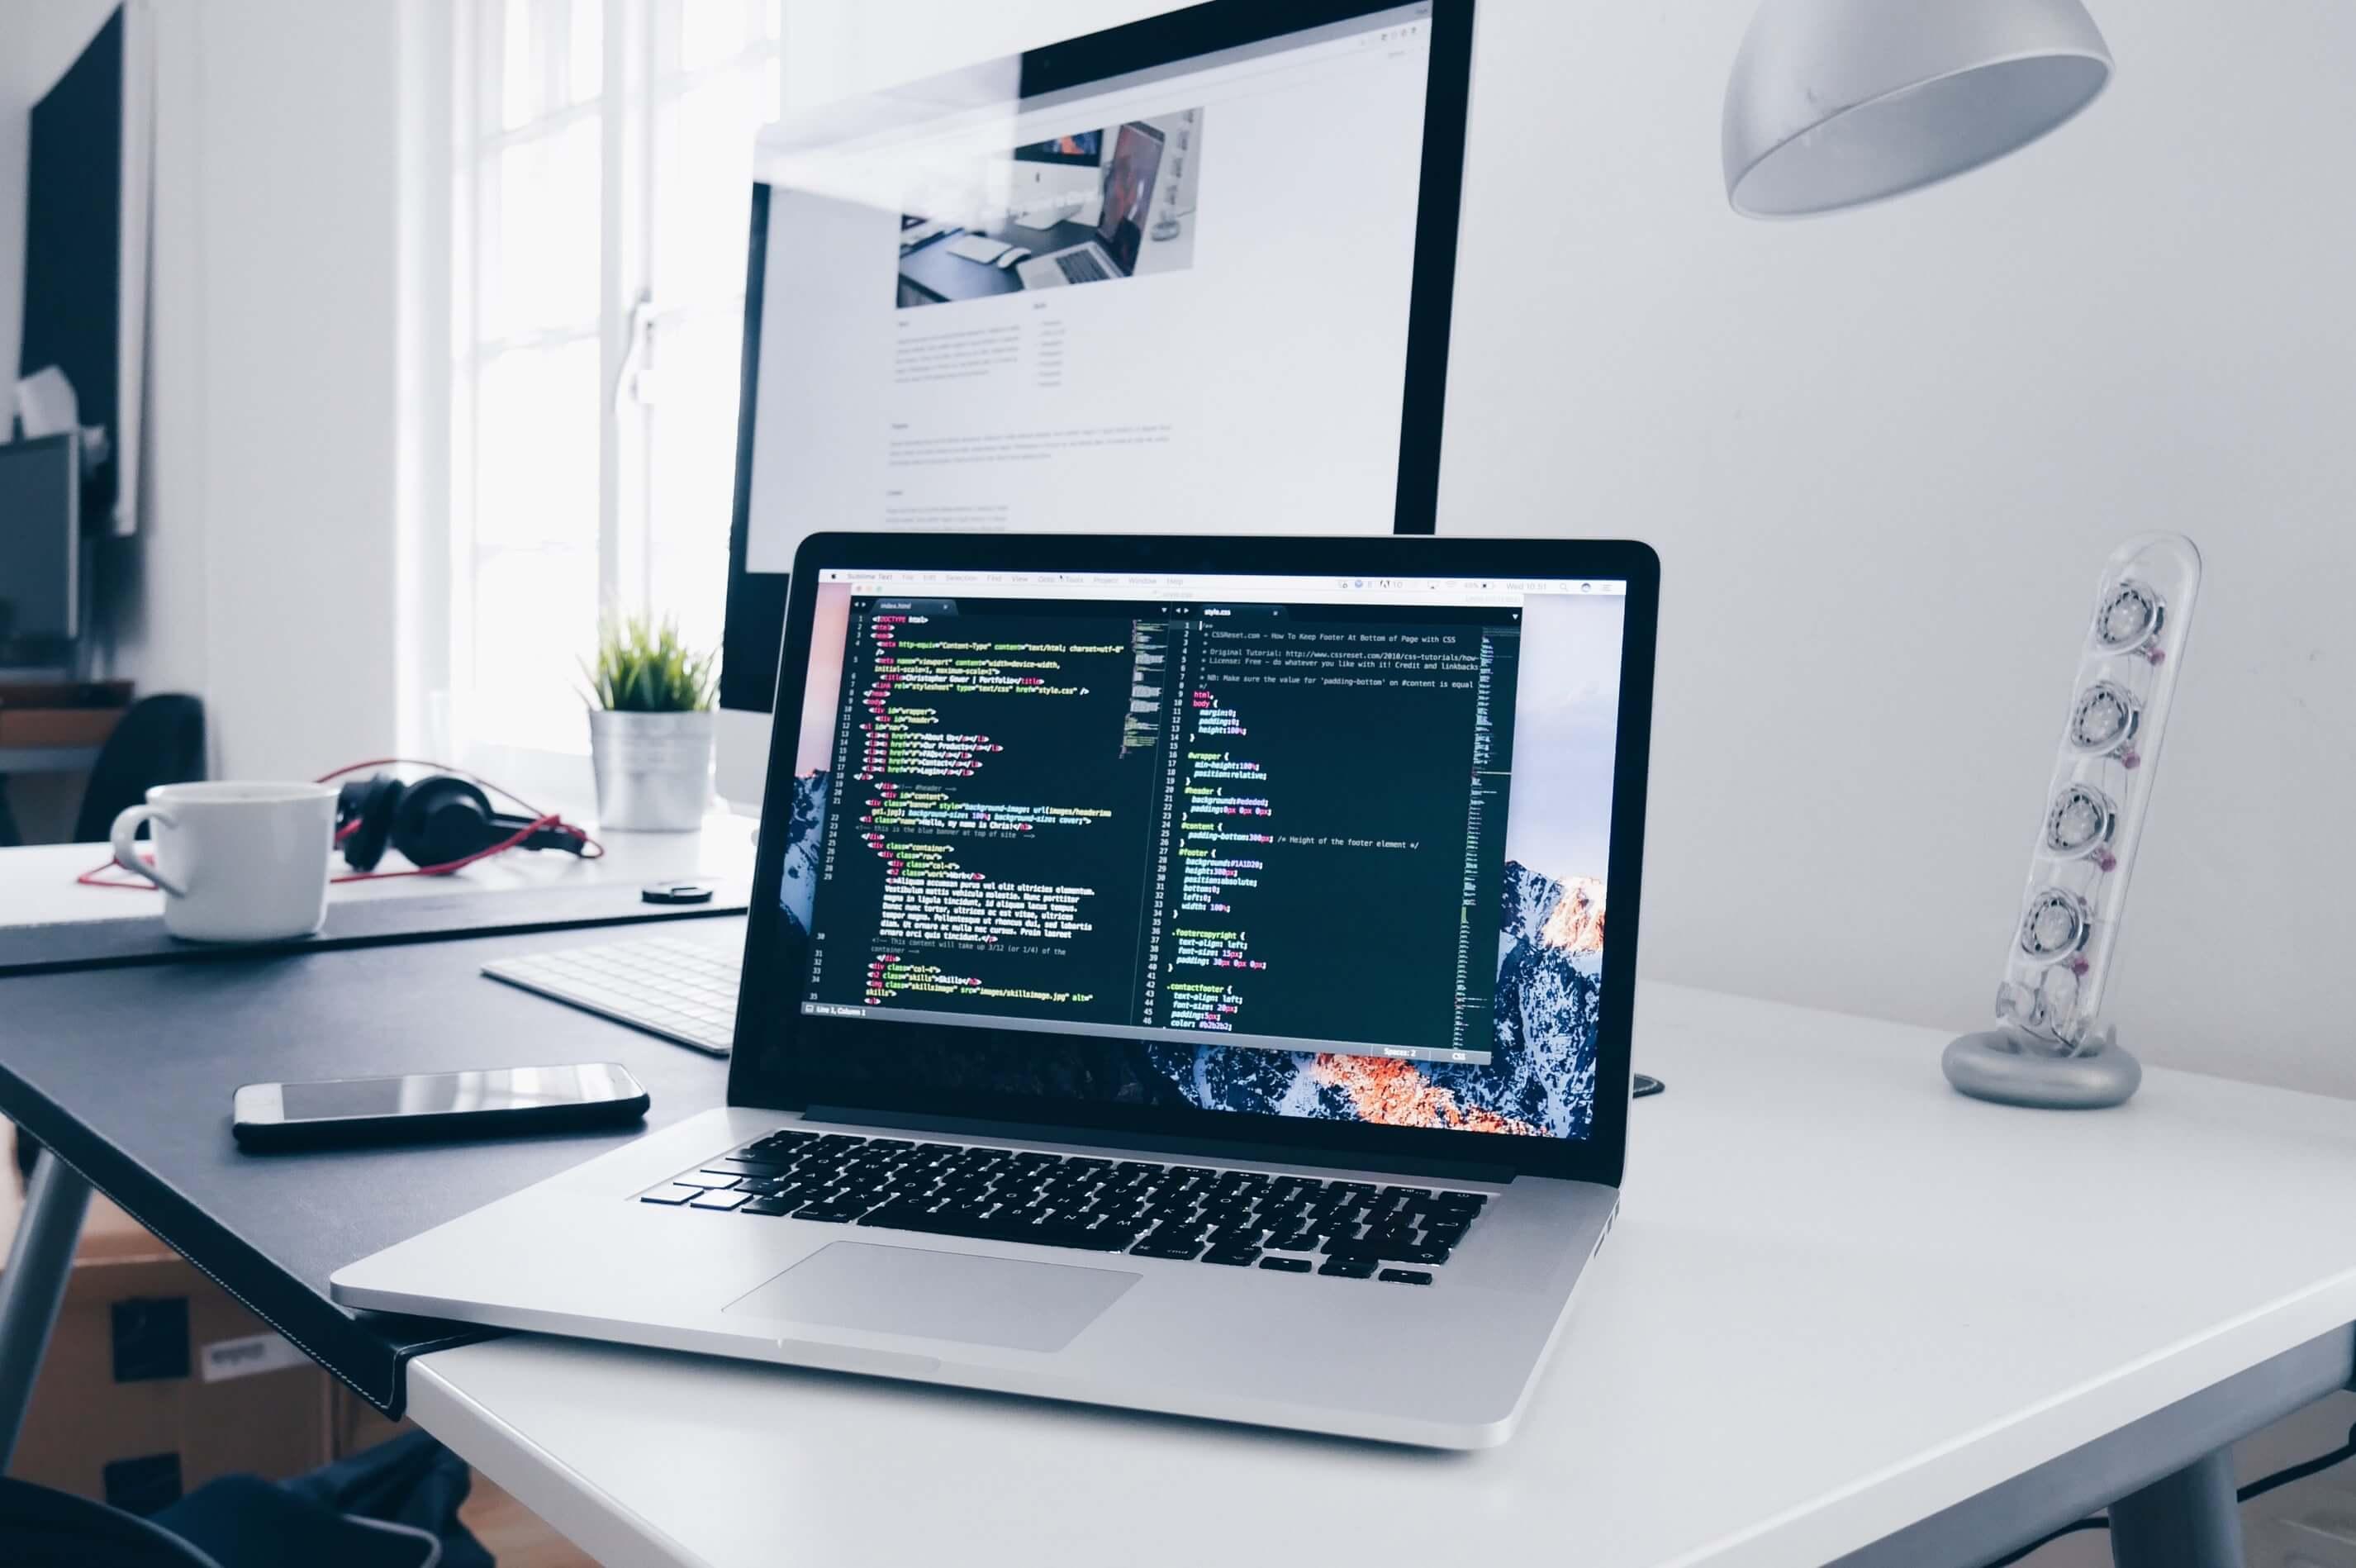 homepage_seisakuコーディングとは?ホームページ制作に欠かせない作業「コーディング」について。